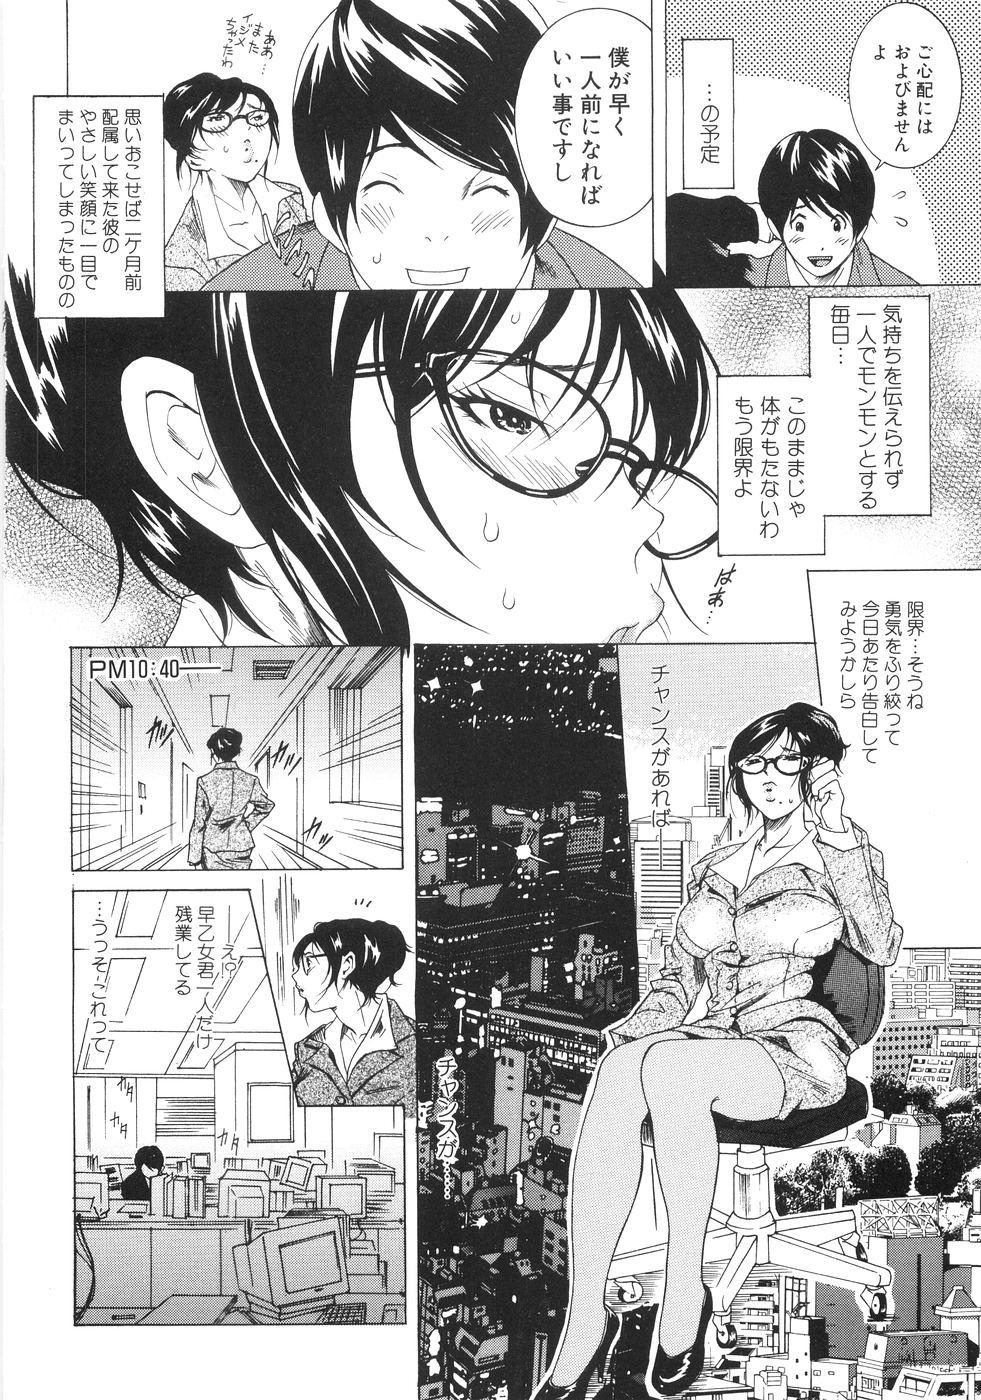 Honki Jiru - Cowper's Gland Liquid? or Love Juice?...?! 40